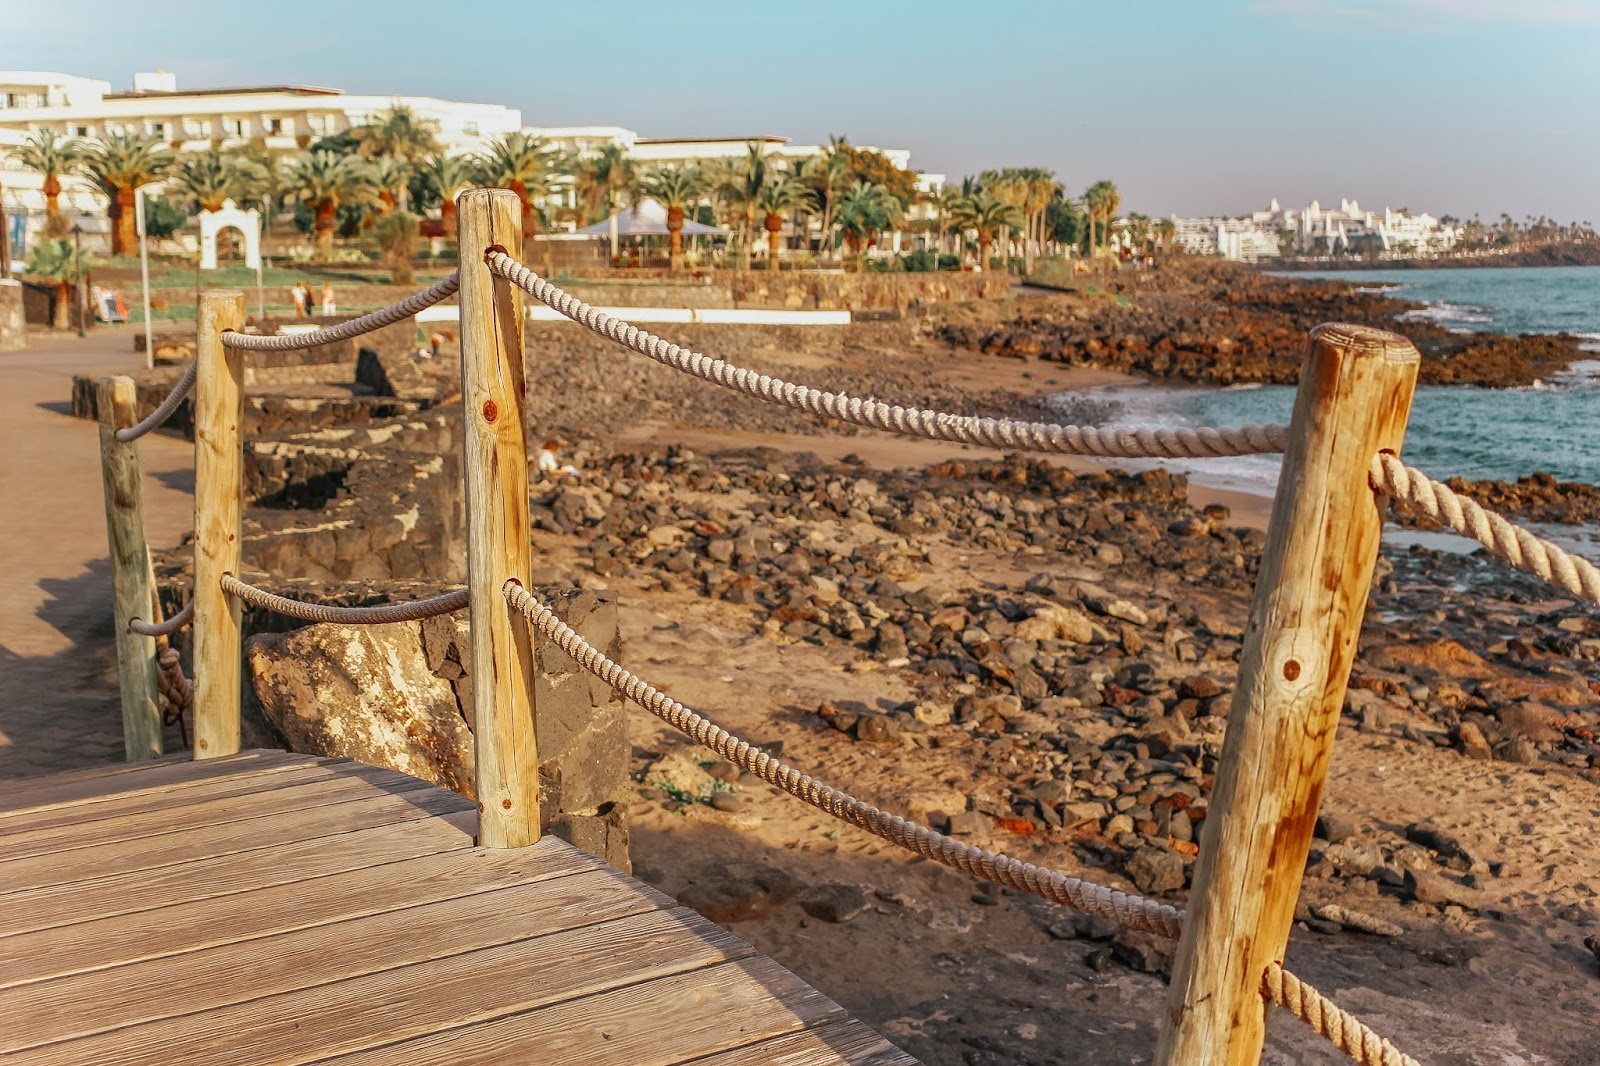 Lanzarote Playa Blanca Seafront Beach Walk